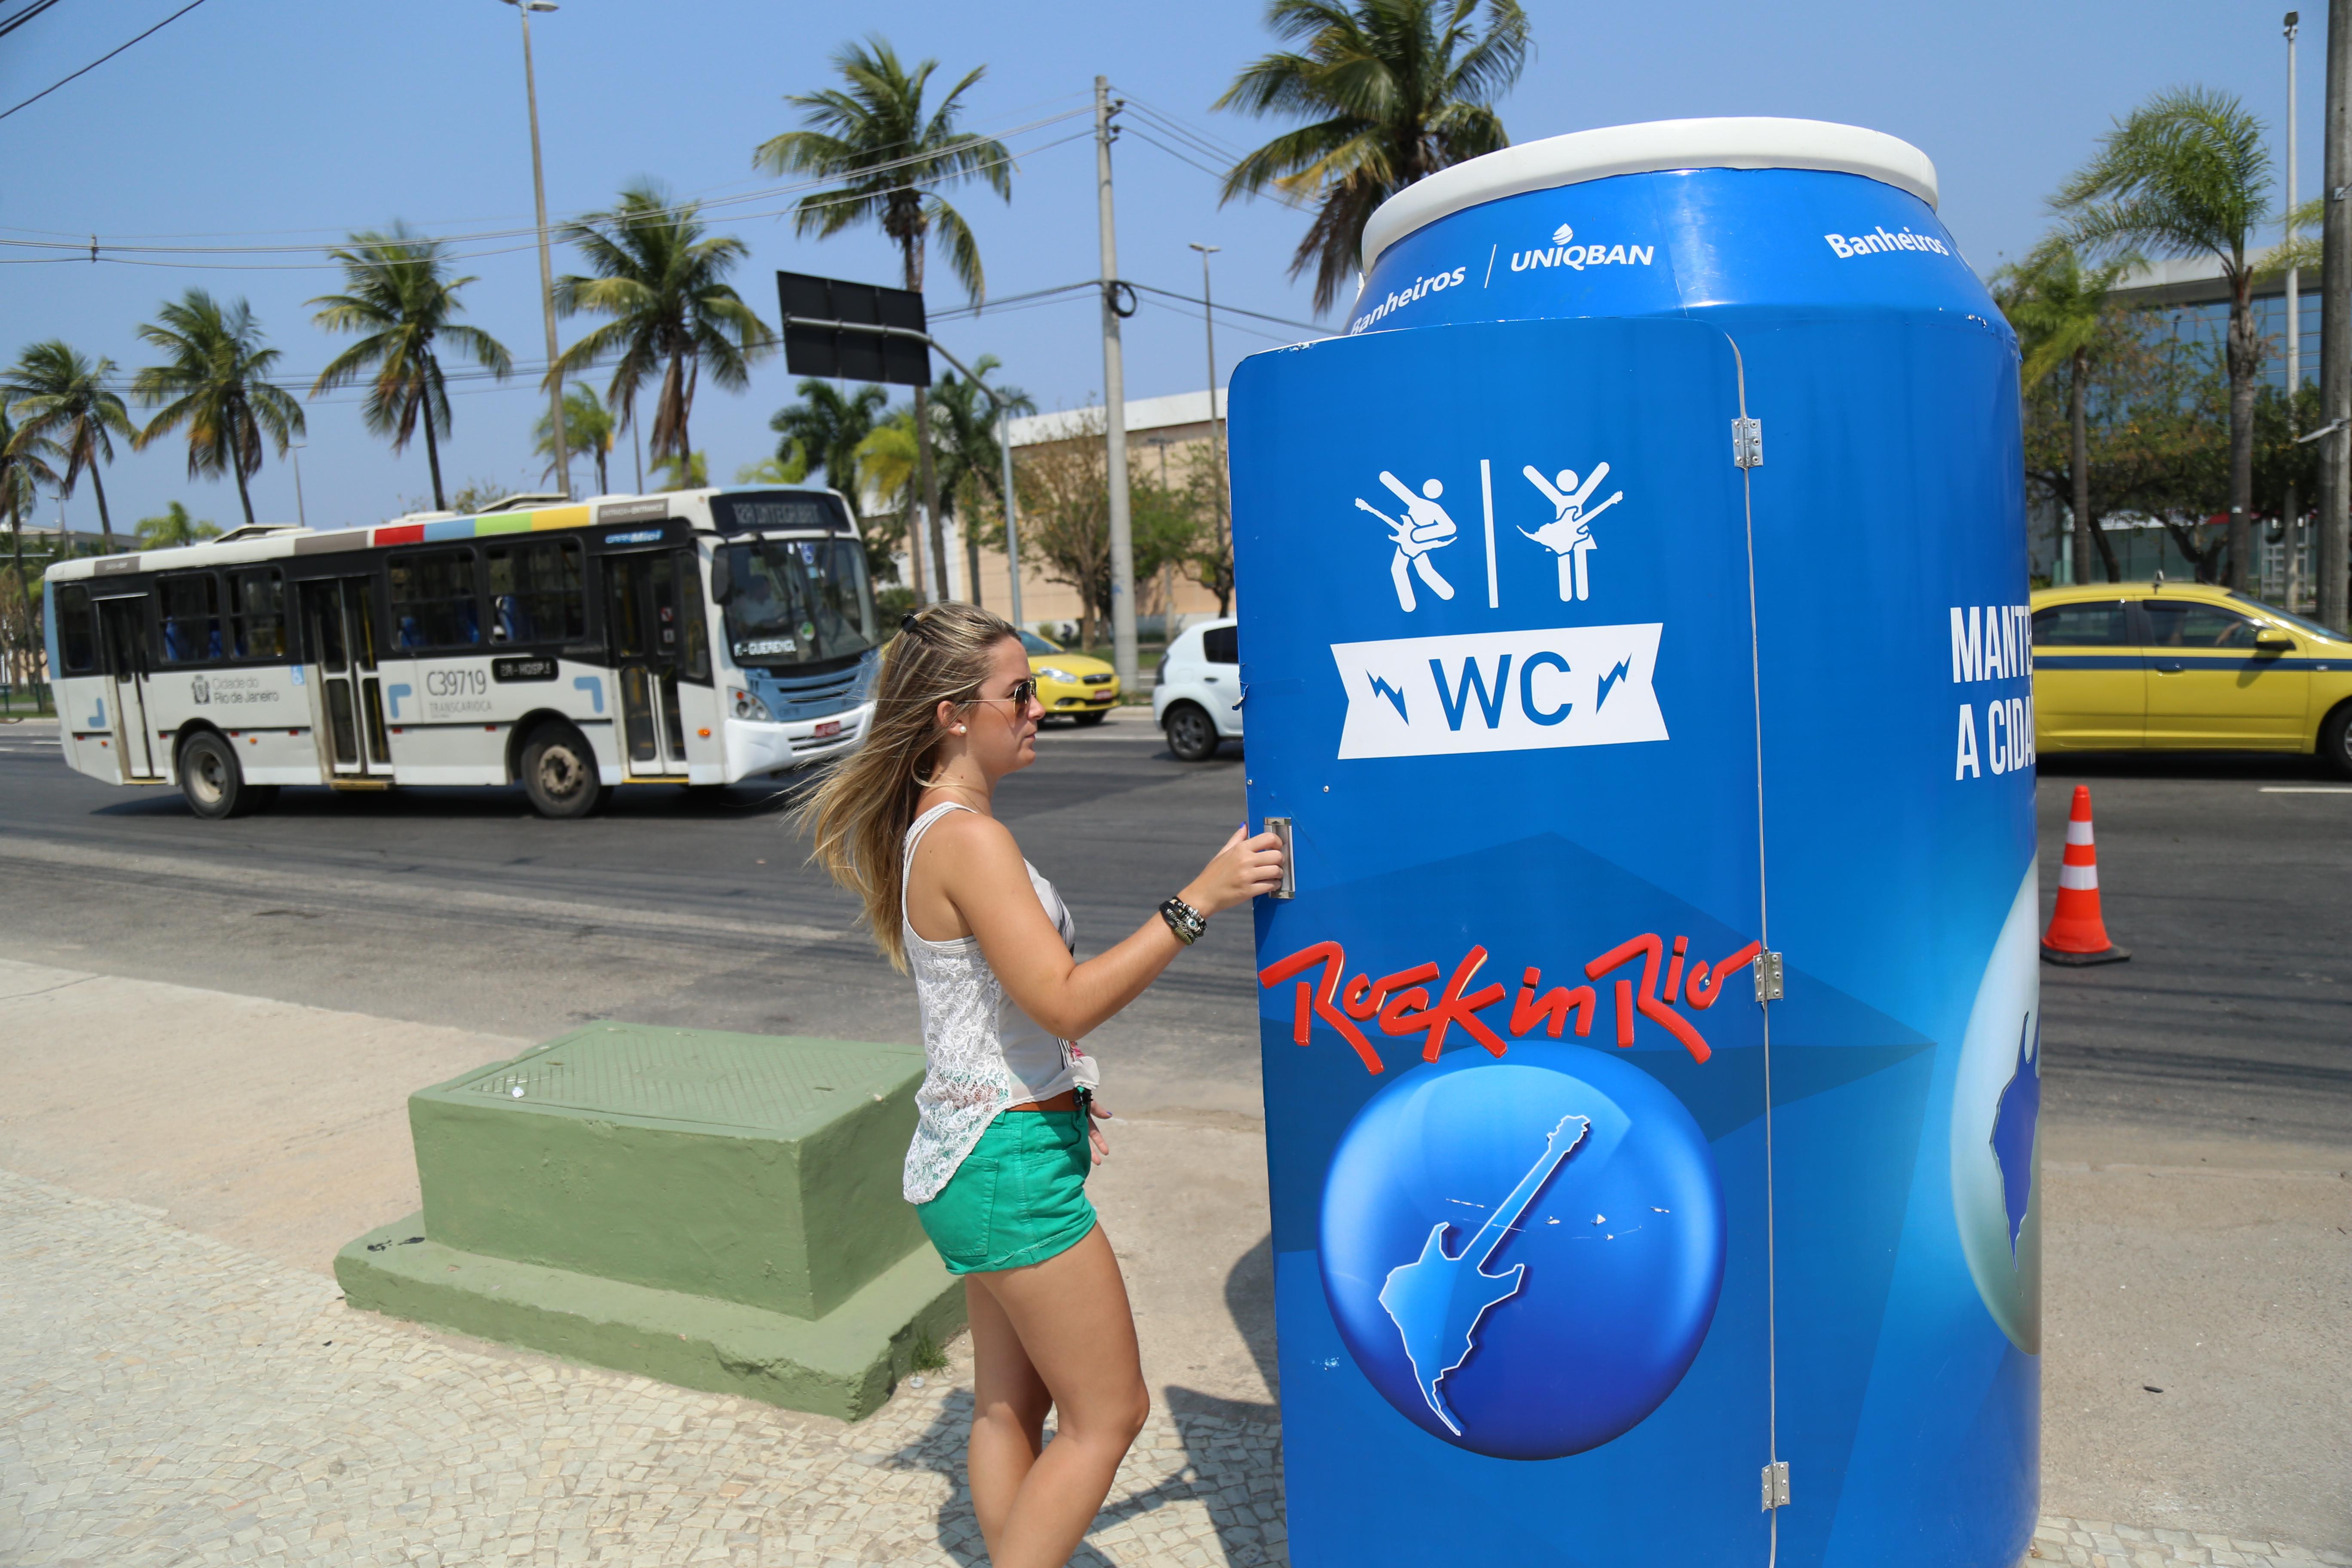 UniqBan foi destaque positivo no Rock in Rio.